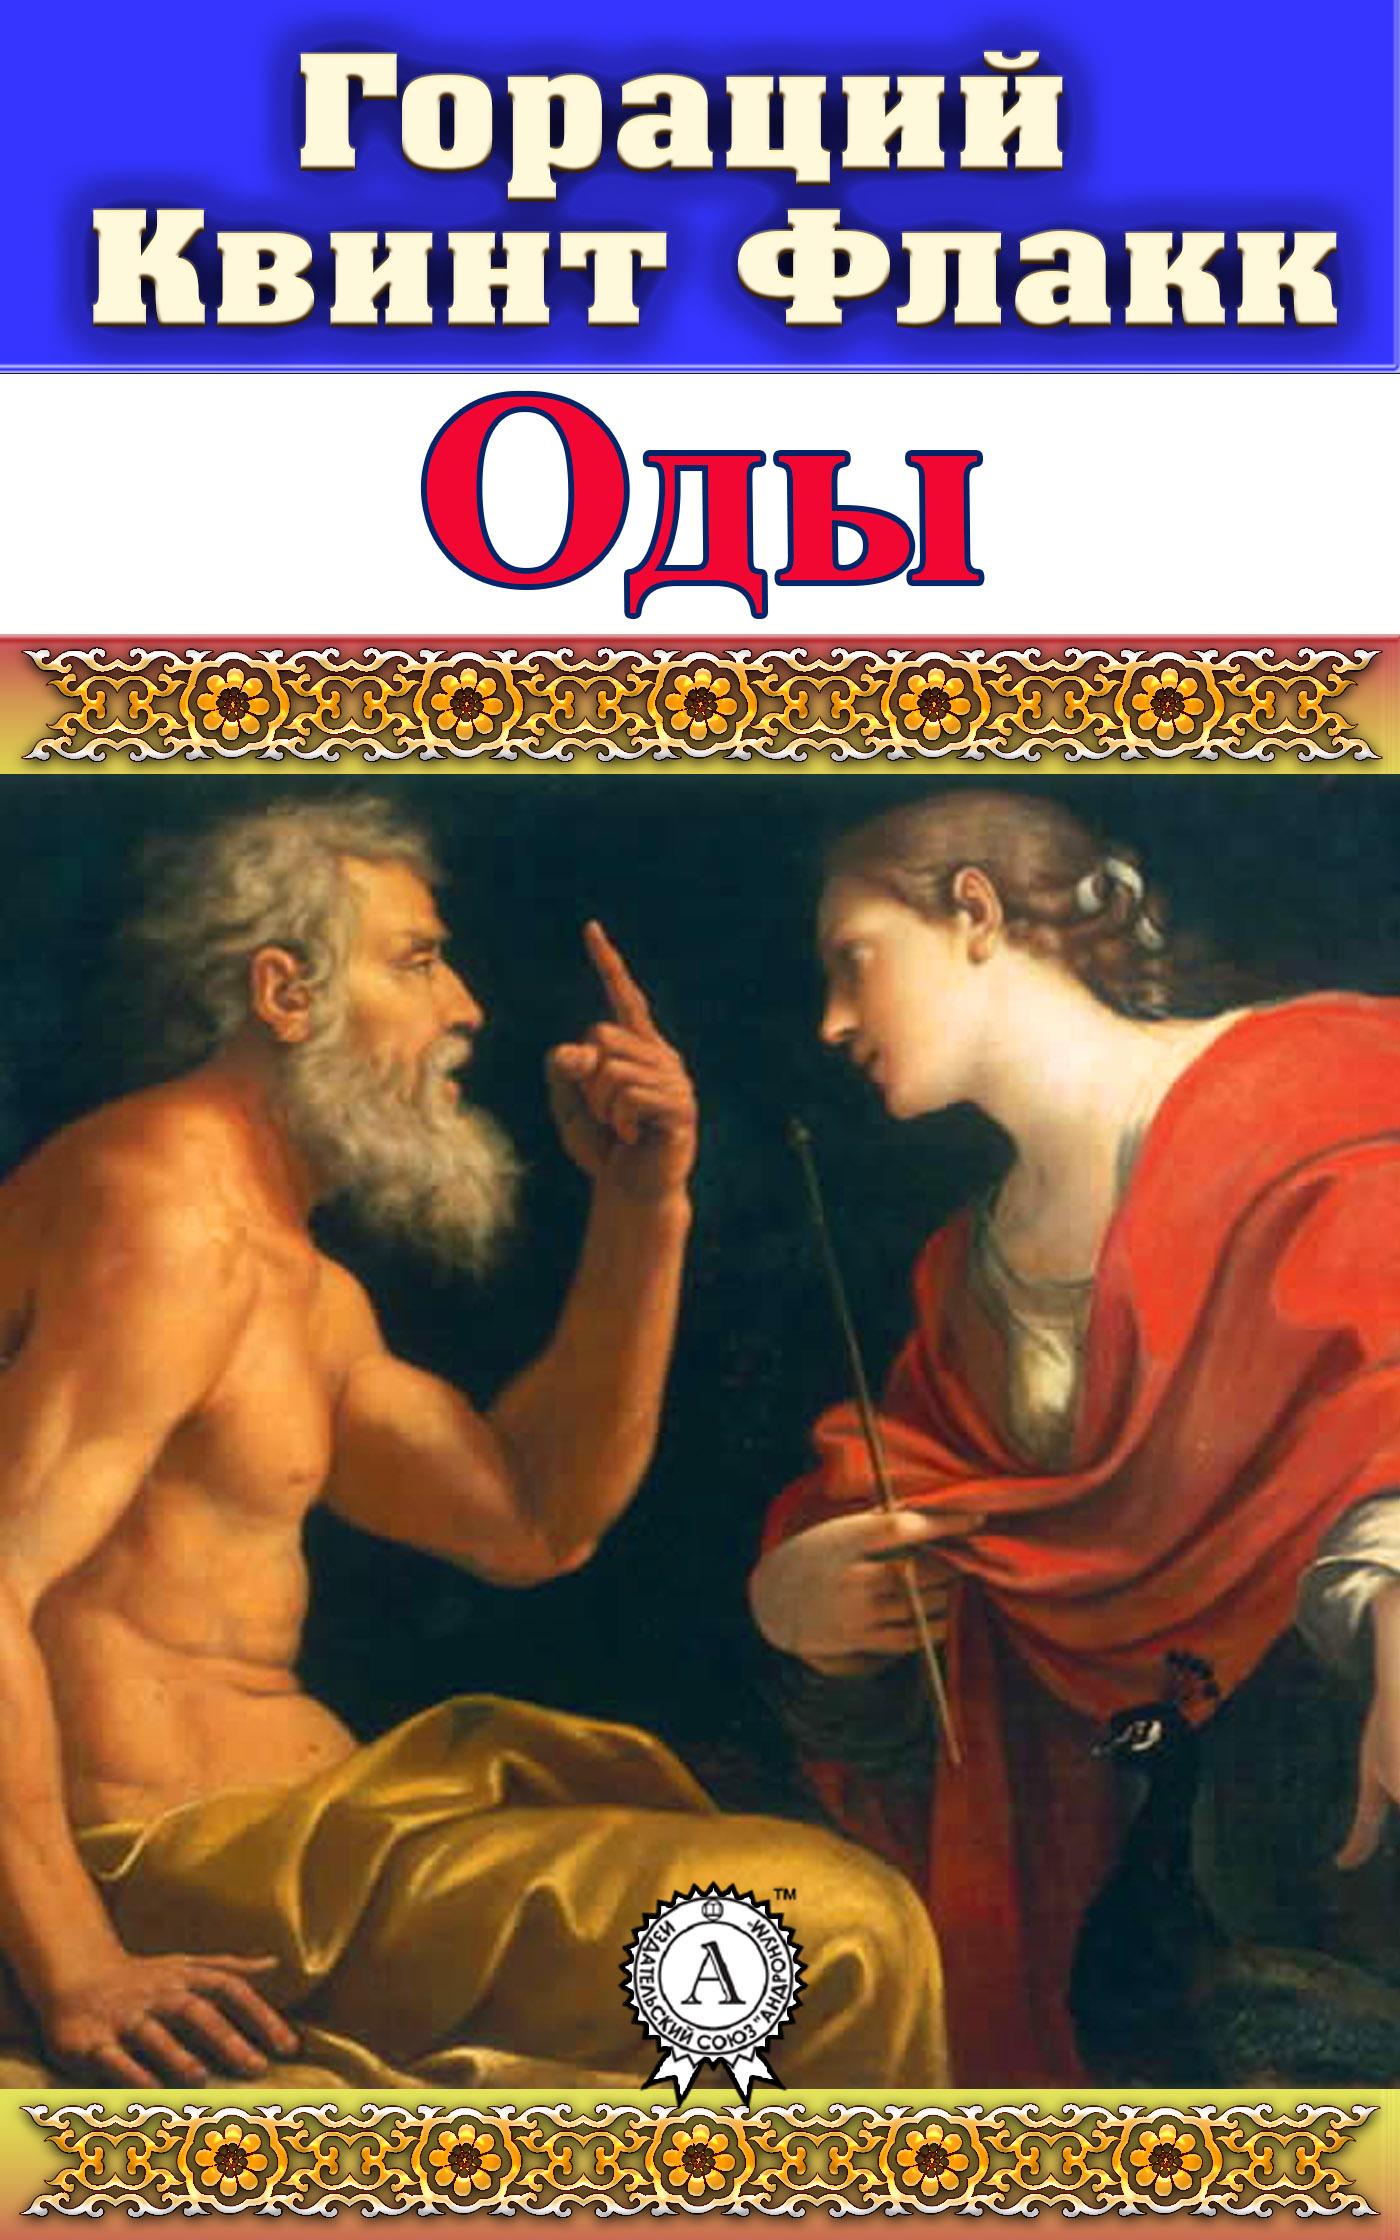 обложка книги static/bookimages/14/68/03/14680325.bin.dir/14680325.cover.jpg